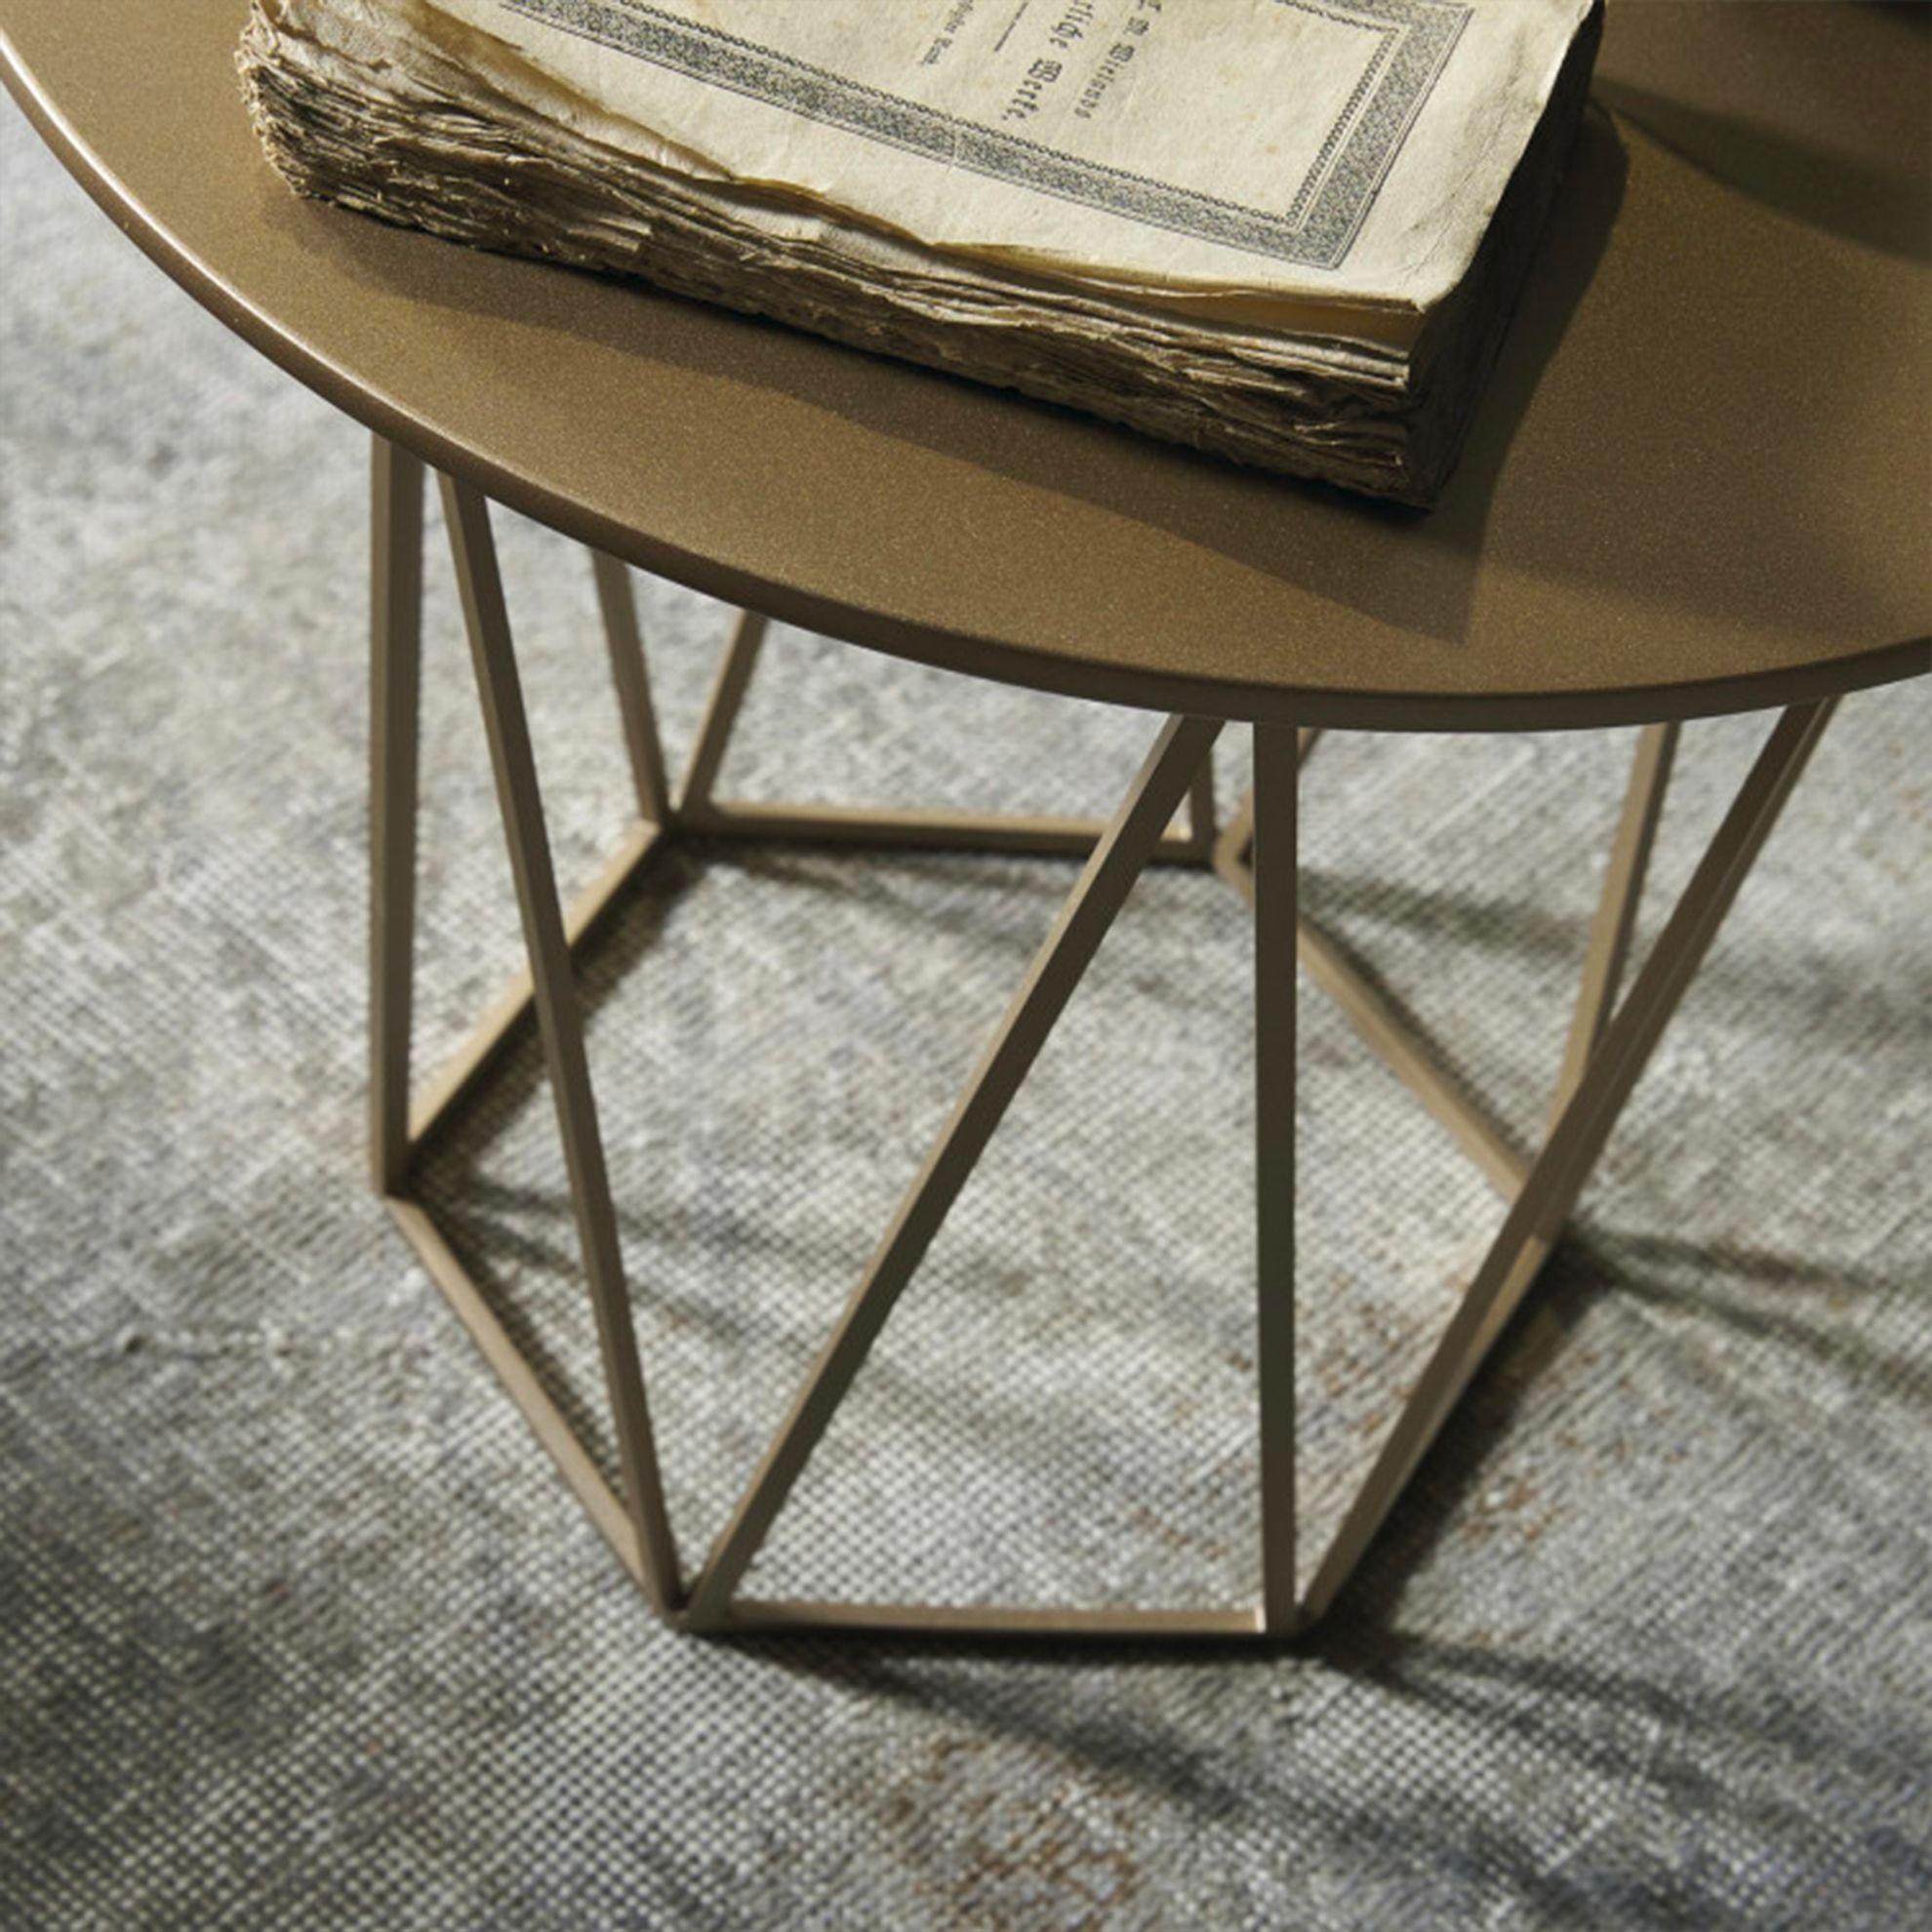 Diamond Coffee Table Is A Modern Italian Coffee Table With A